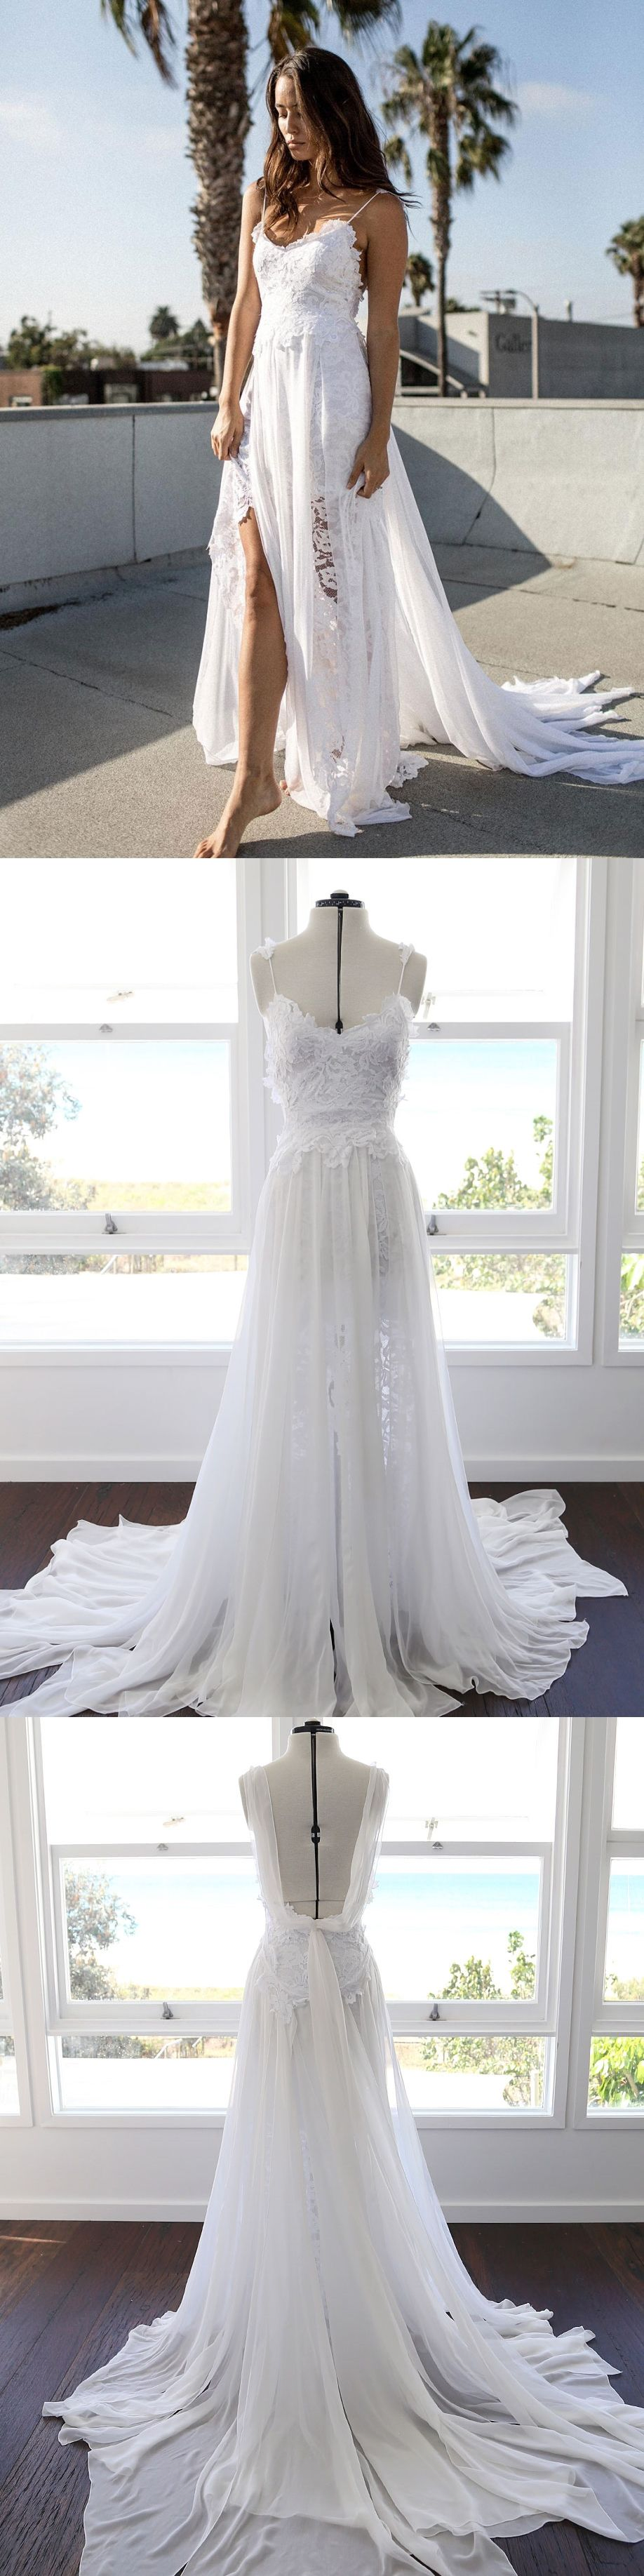 a288b3a83686 Ivory Tulle Beaded Wedding Dresses Spaghetti Strap V Neck Bridal Dress. Spaghetti  Strap White wedding dresses,cheap beach wedding dresses,simple wedding ...